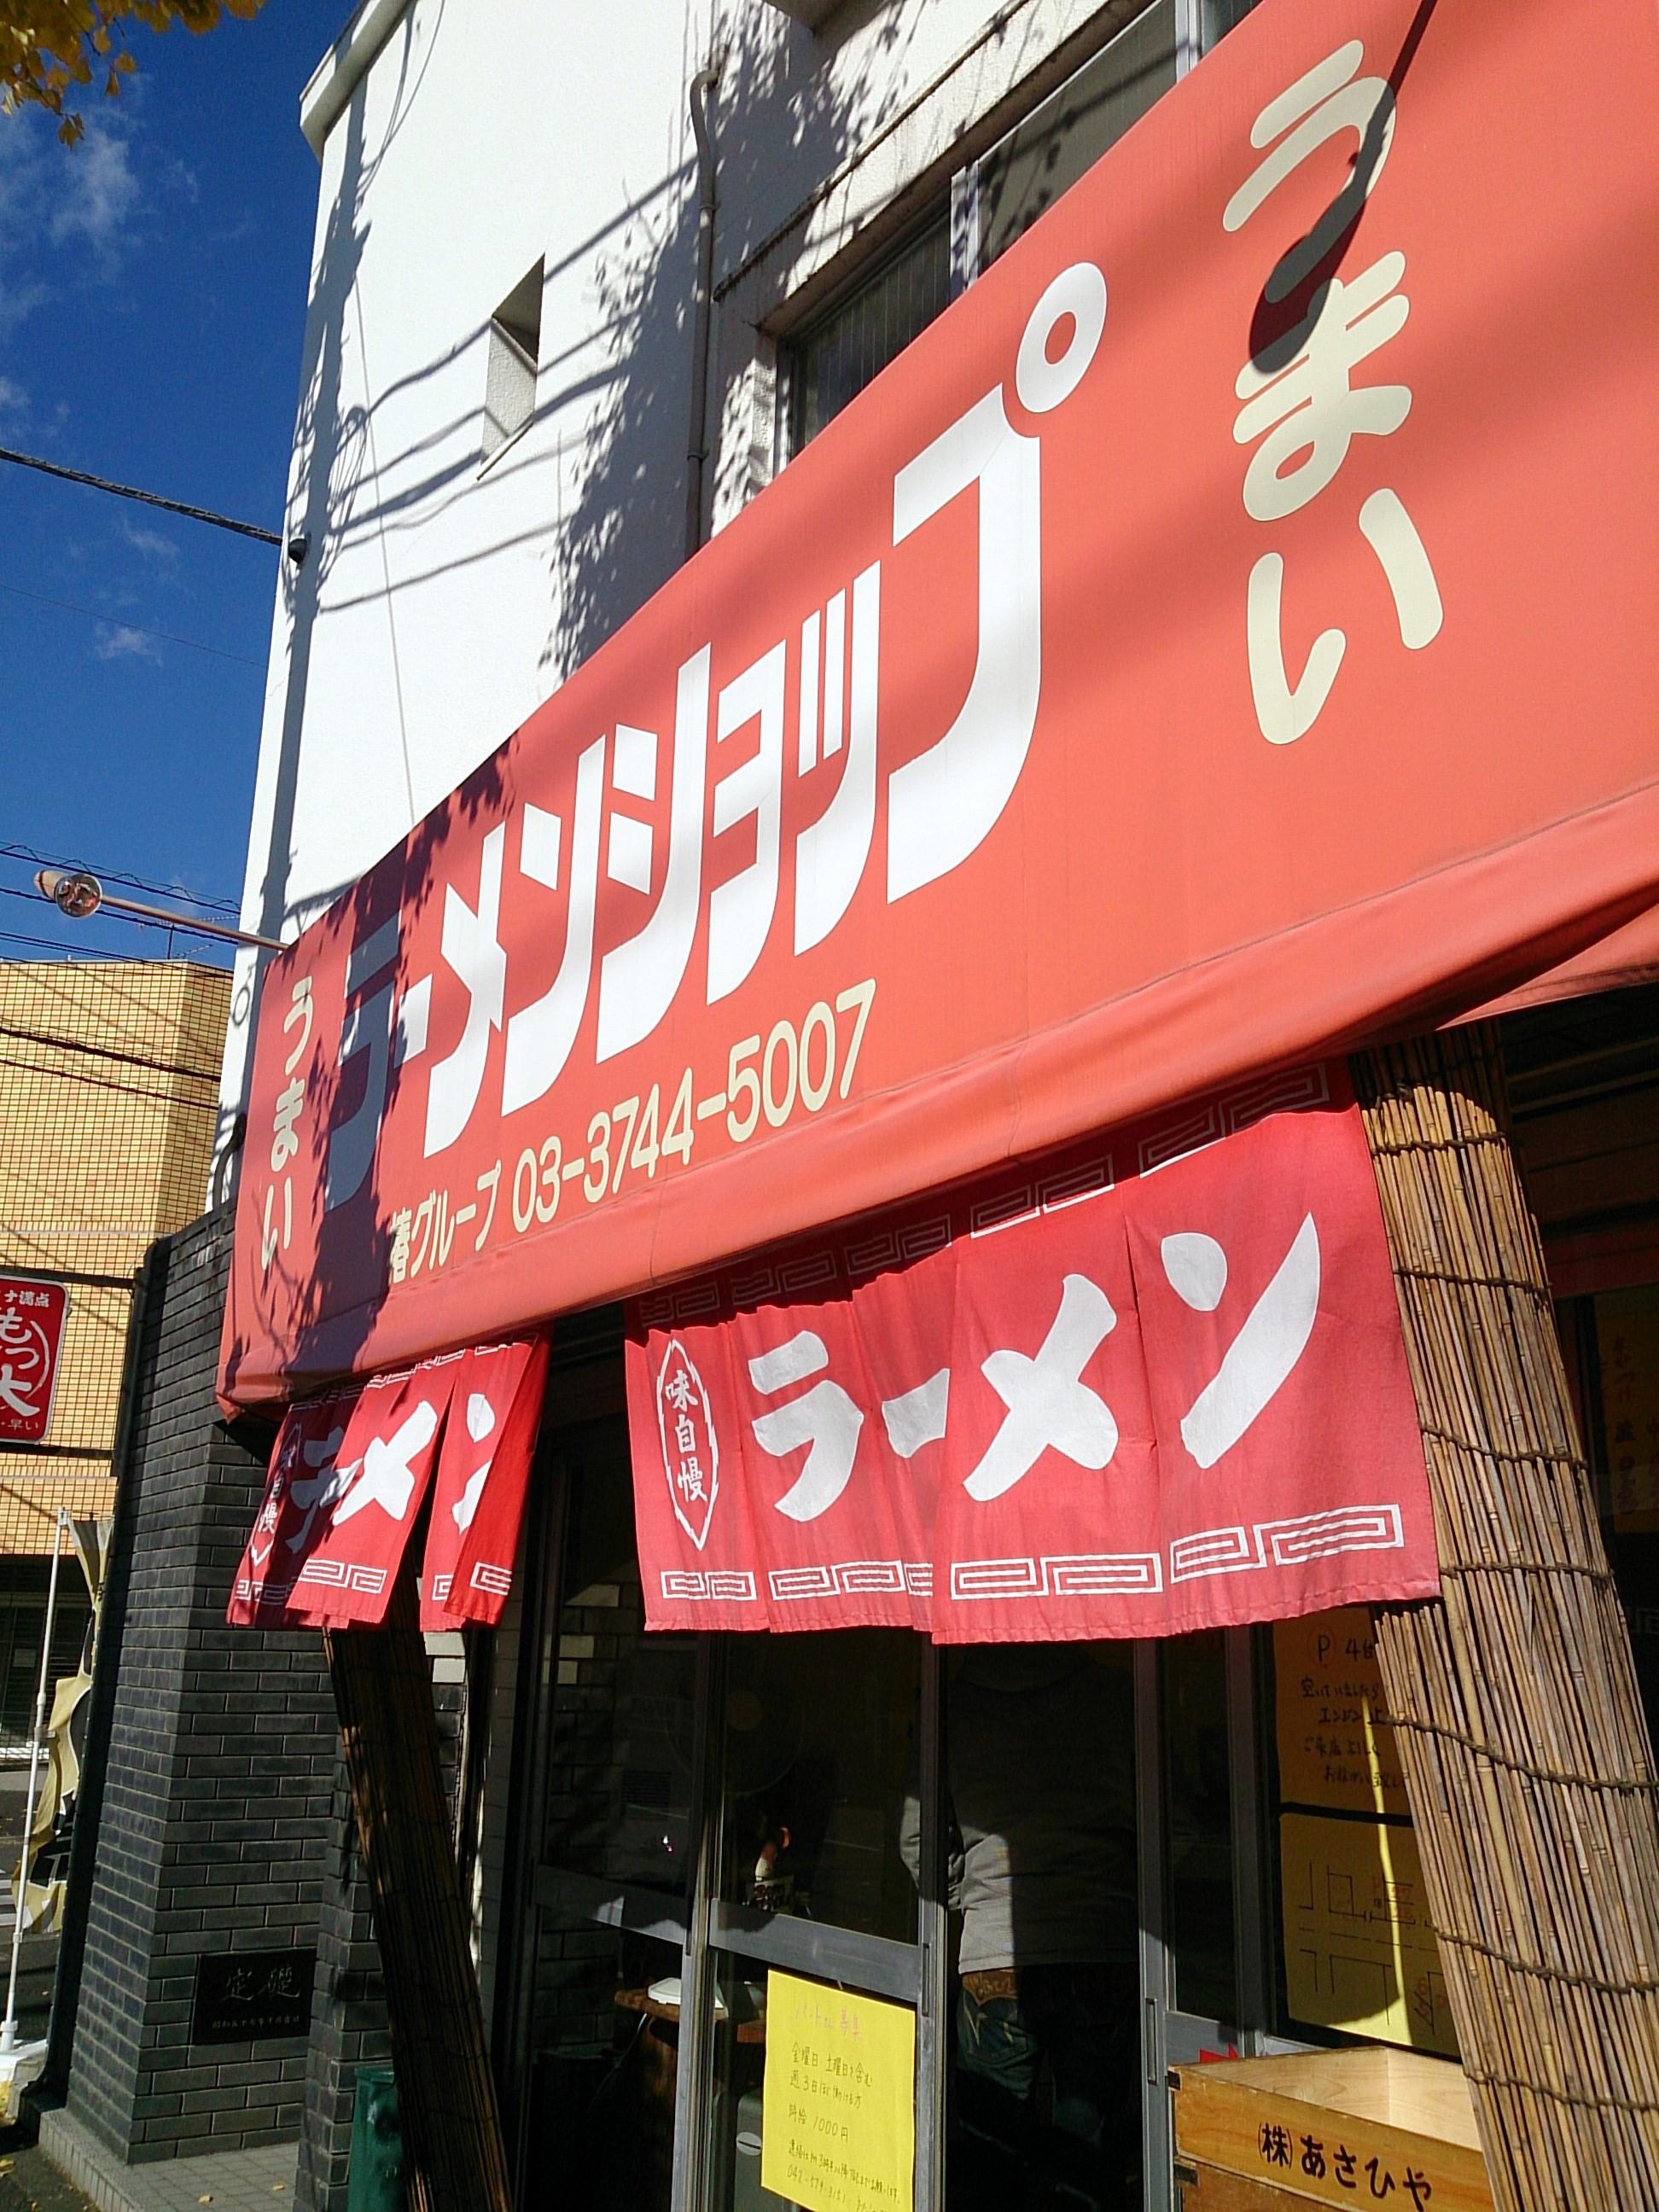 NoodlesTsubaki_20141213-01.jpg